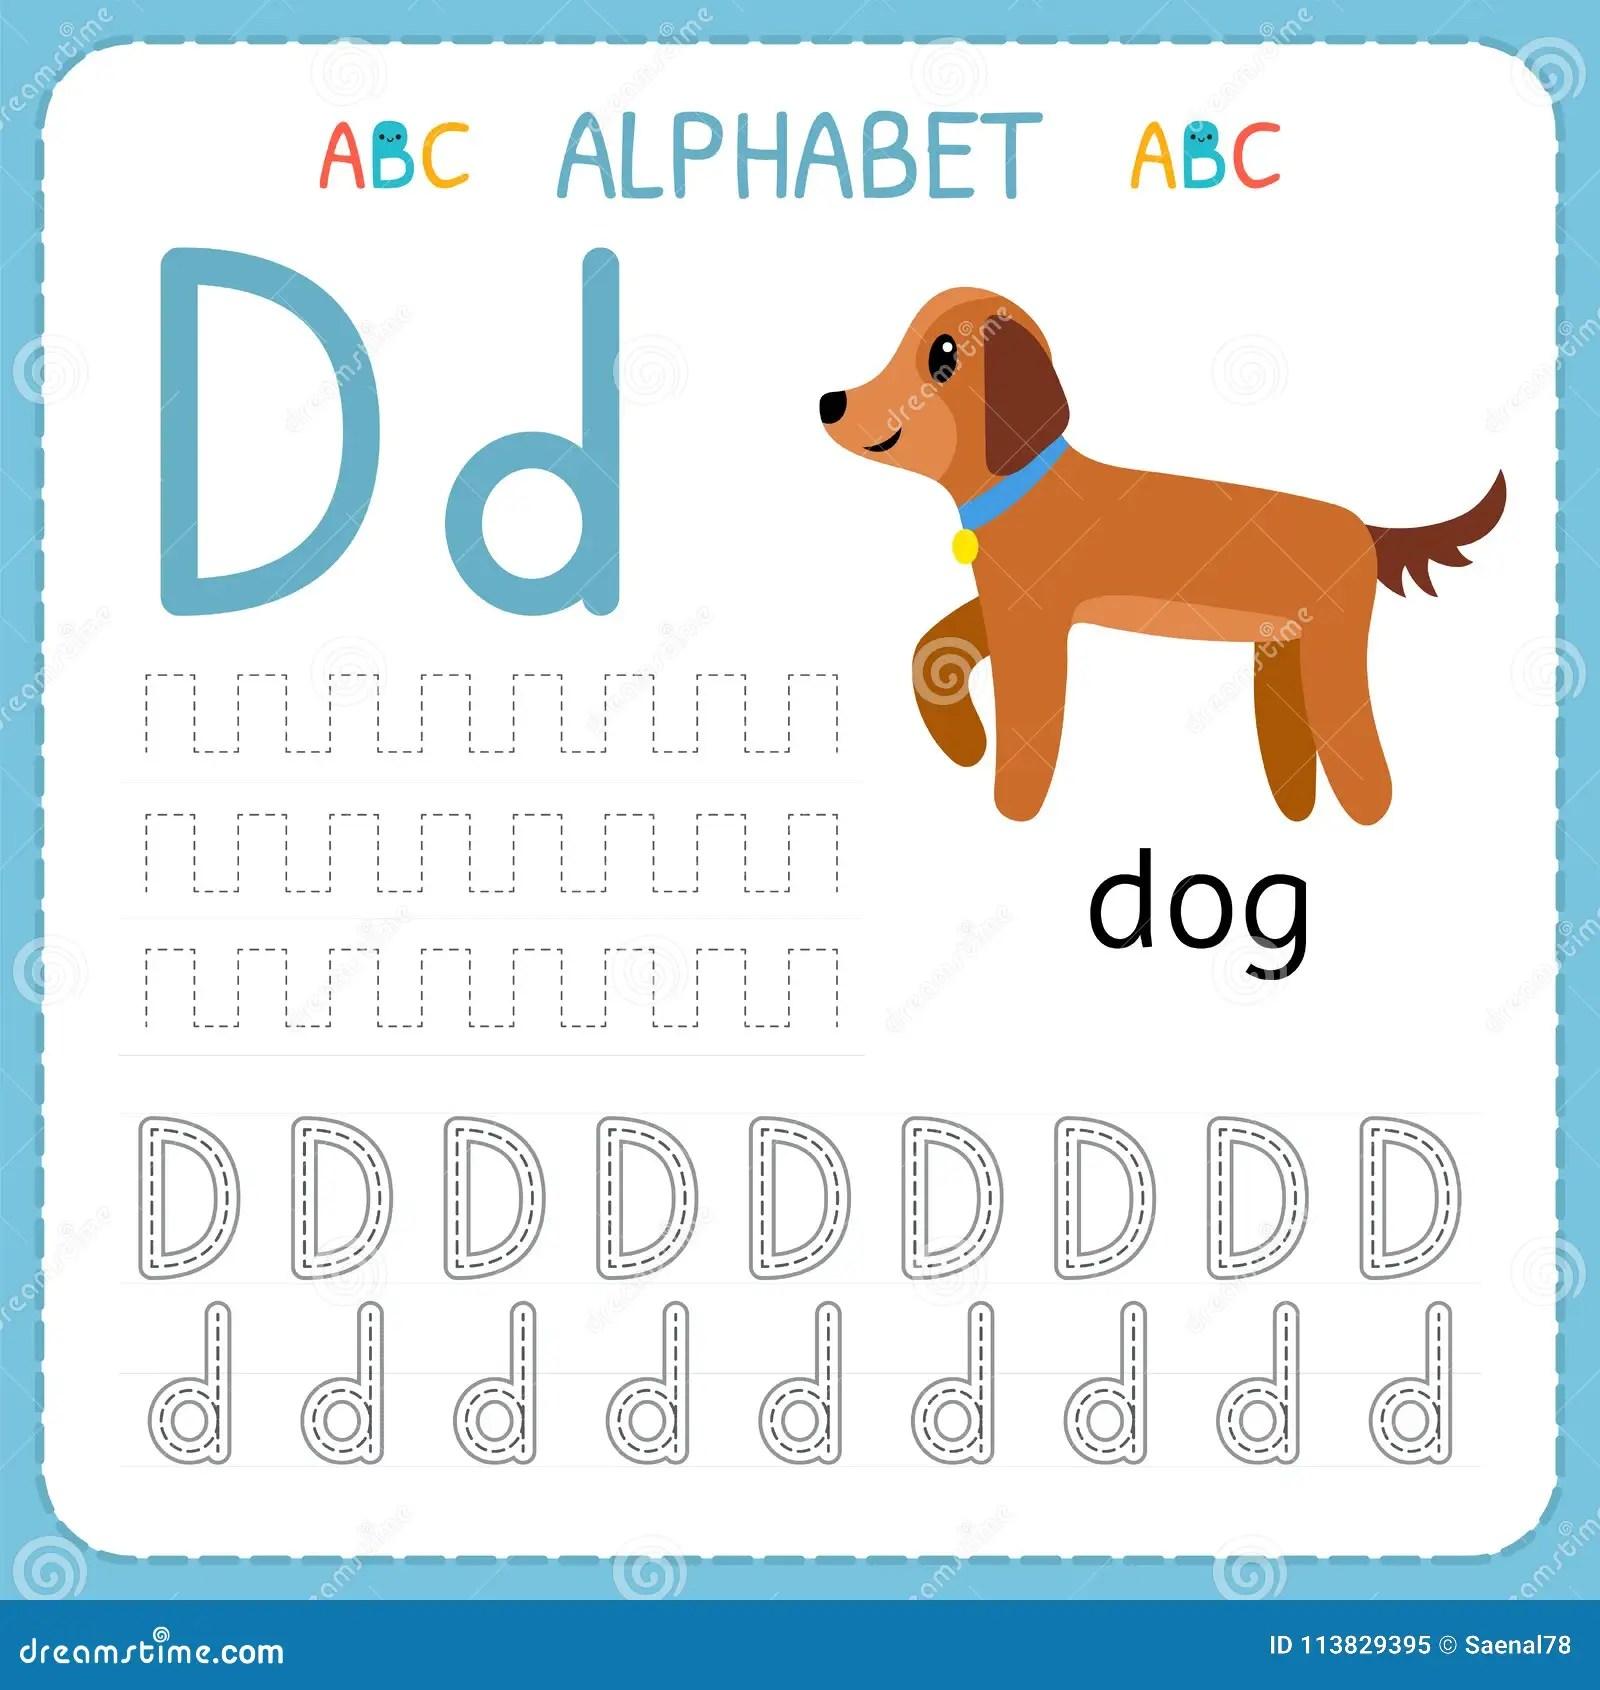 Alphabet Tracing Worksheet For Preschool And Kindergarten Writing Practice Letter D Exercises